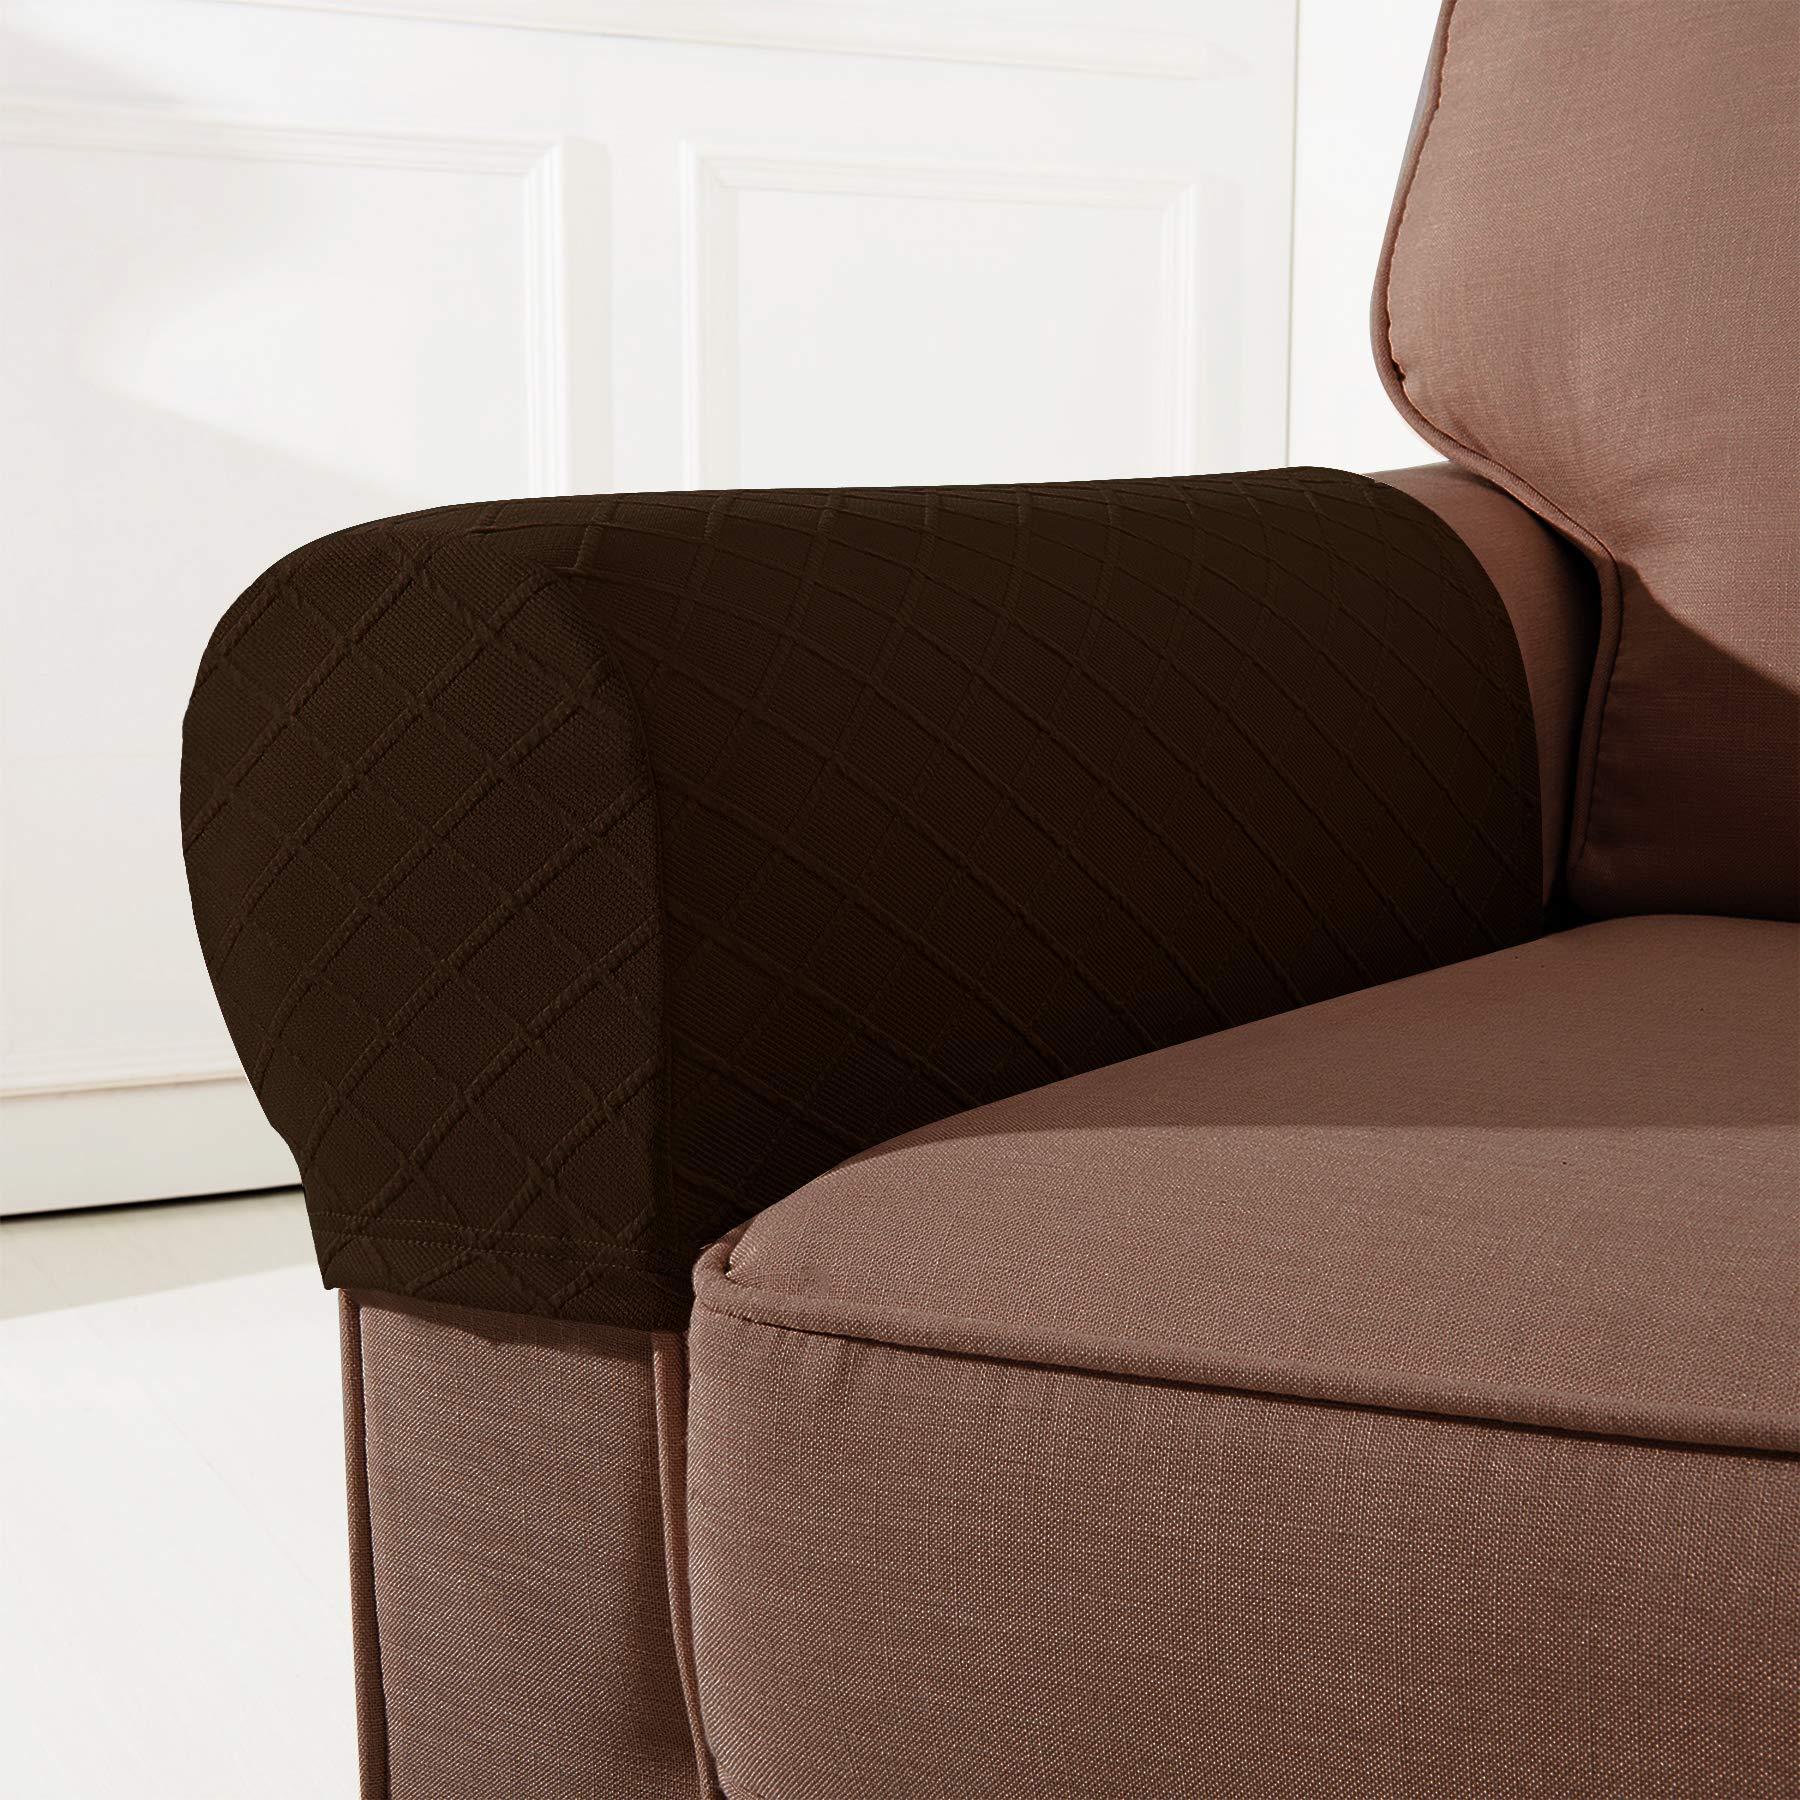 CHUN YI Set of 2 Rhombus Jacquard Stretch Polyester Spandex Fabric Armrest Cover (Armrest, Chocolate)